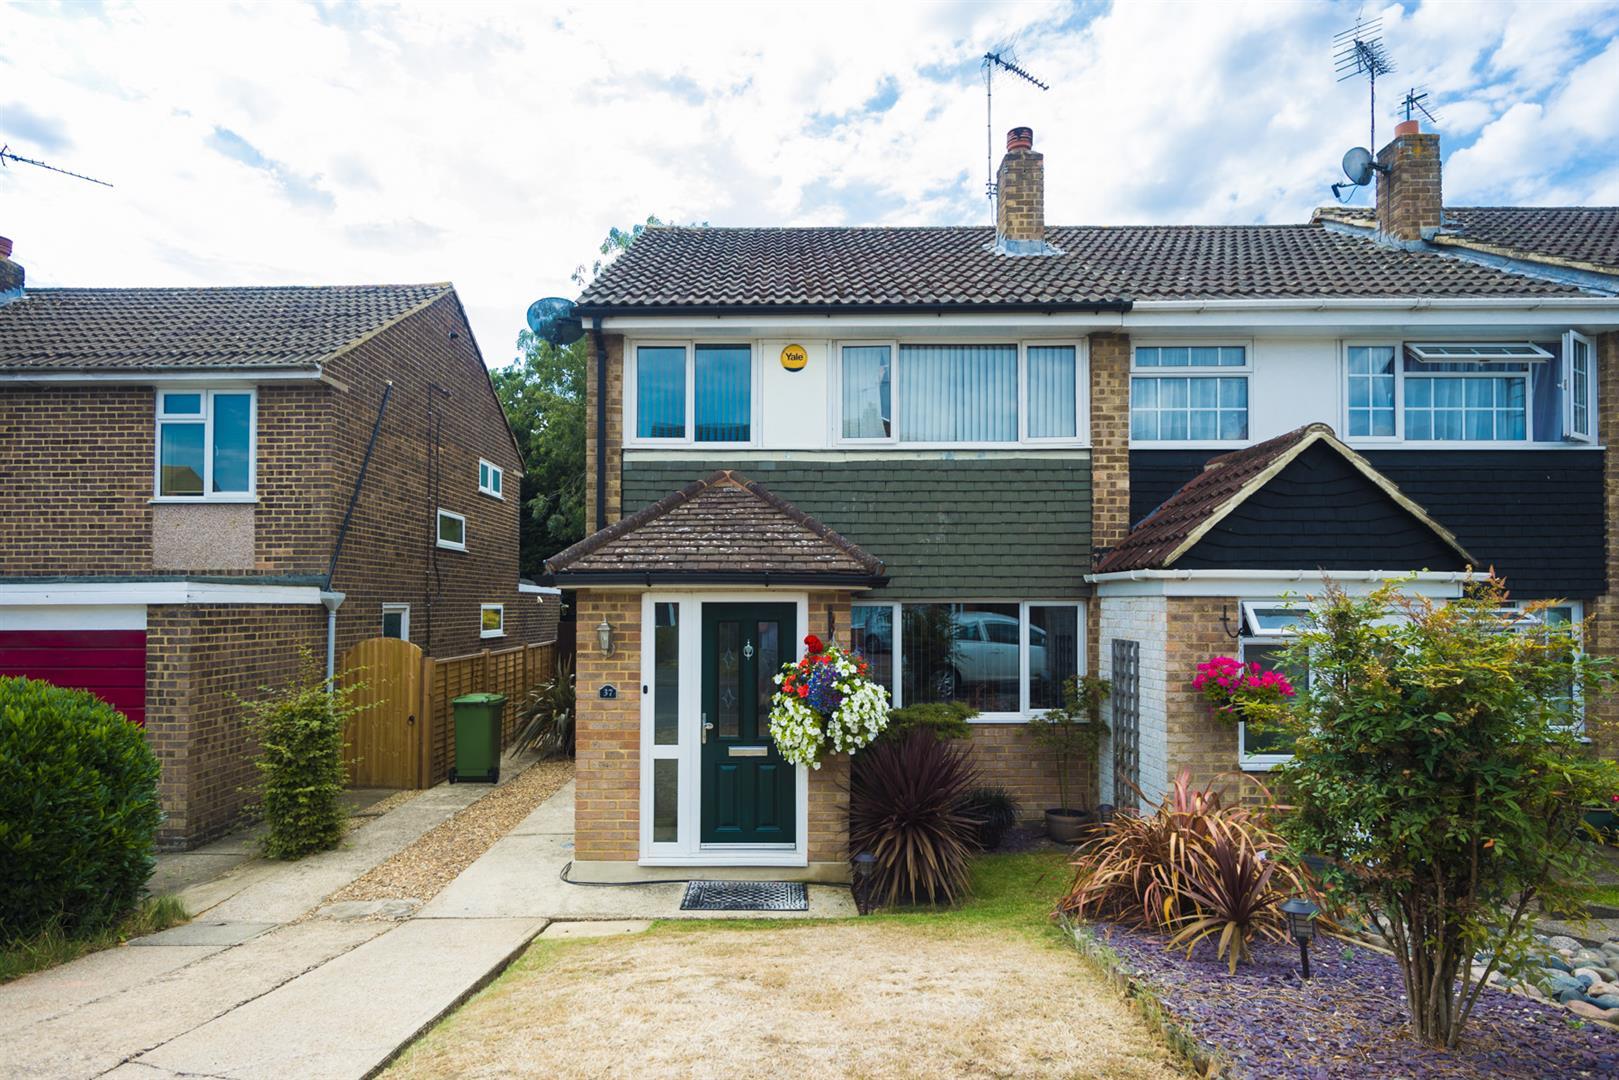 Lavender Avenue, Pilgrims Hatch, Brentwood